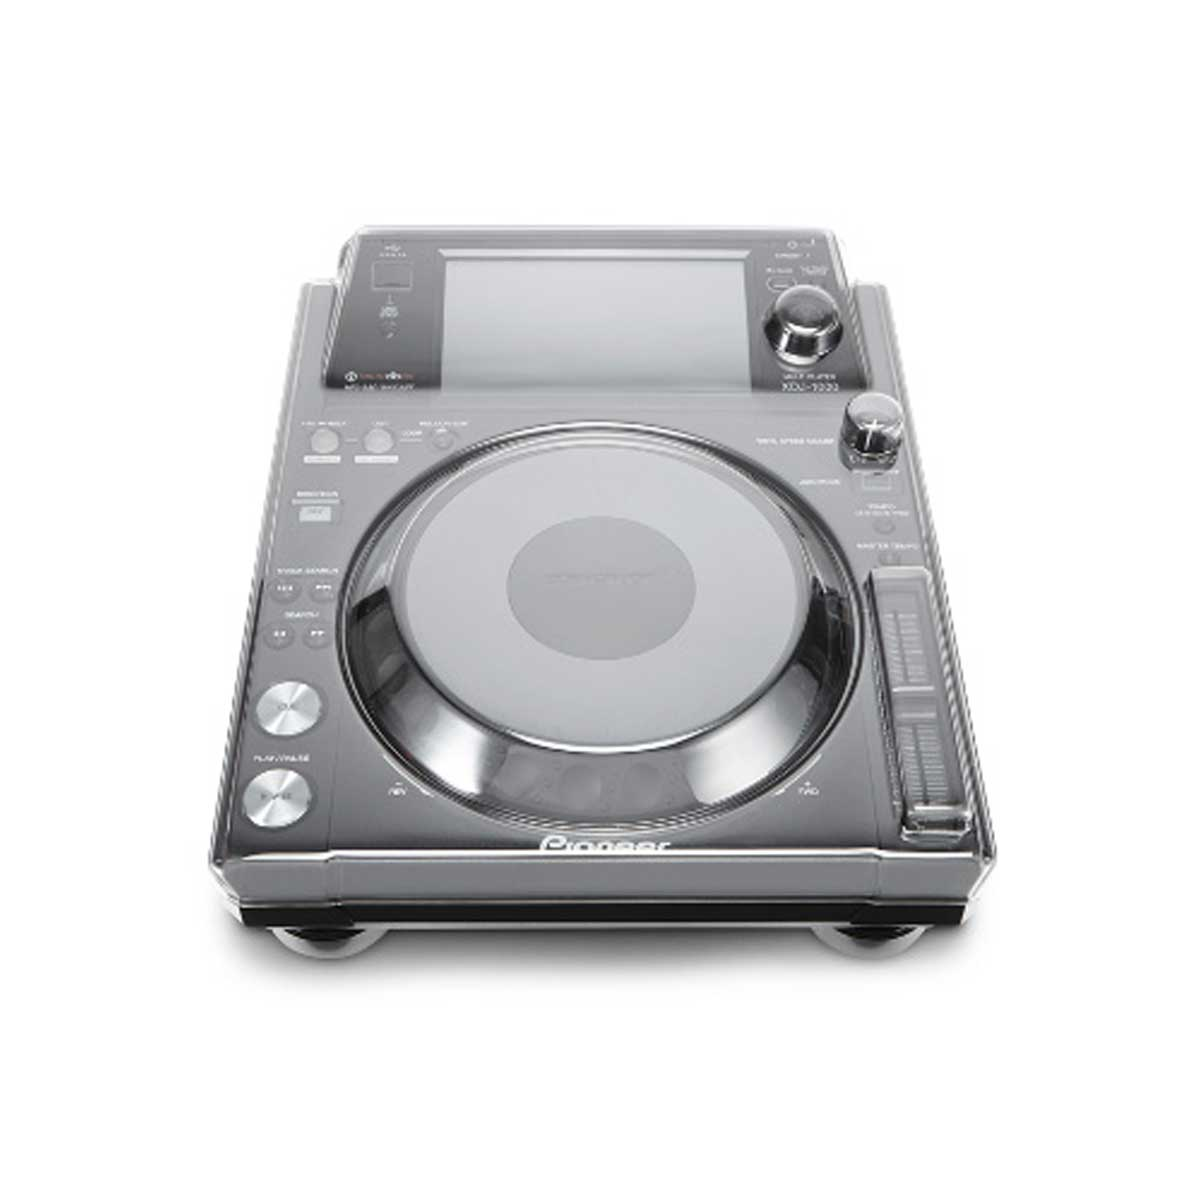 Decksaver デッキセーバー / DS-PC-XDJ1000 XDJ-1000用保護カバー【お取り寄せ商品】